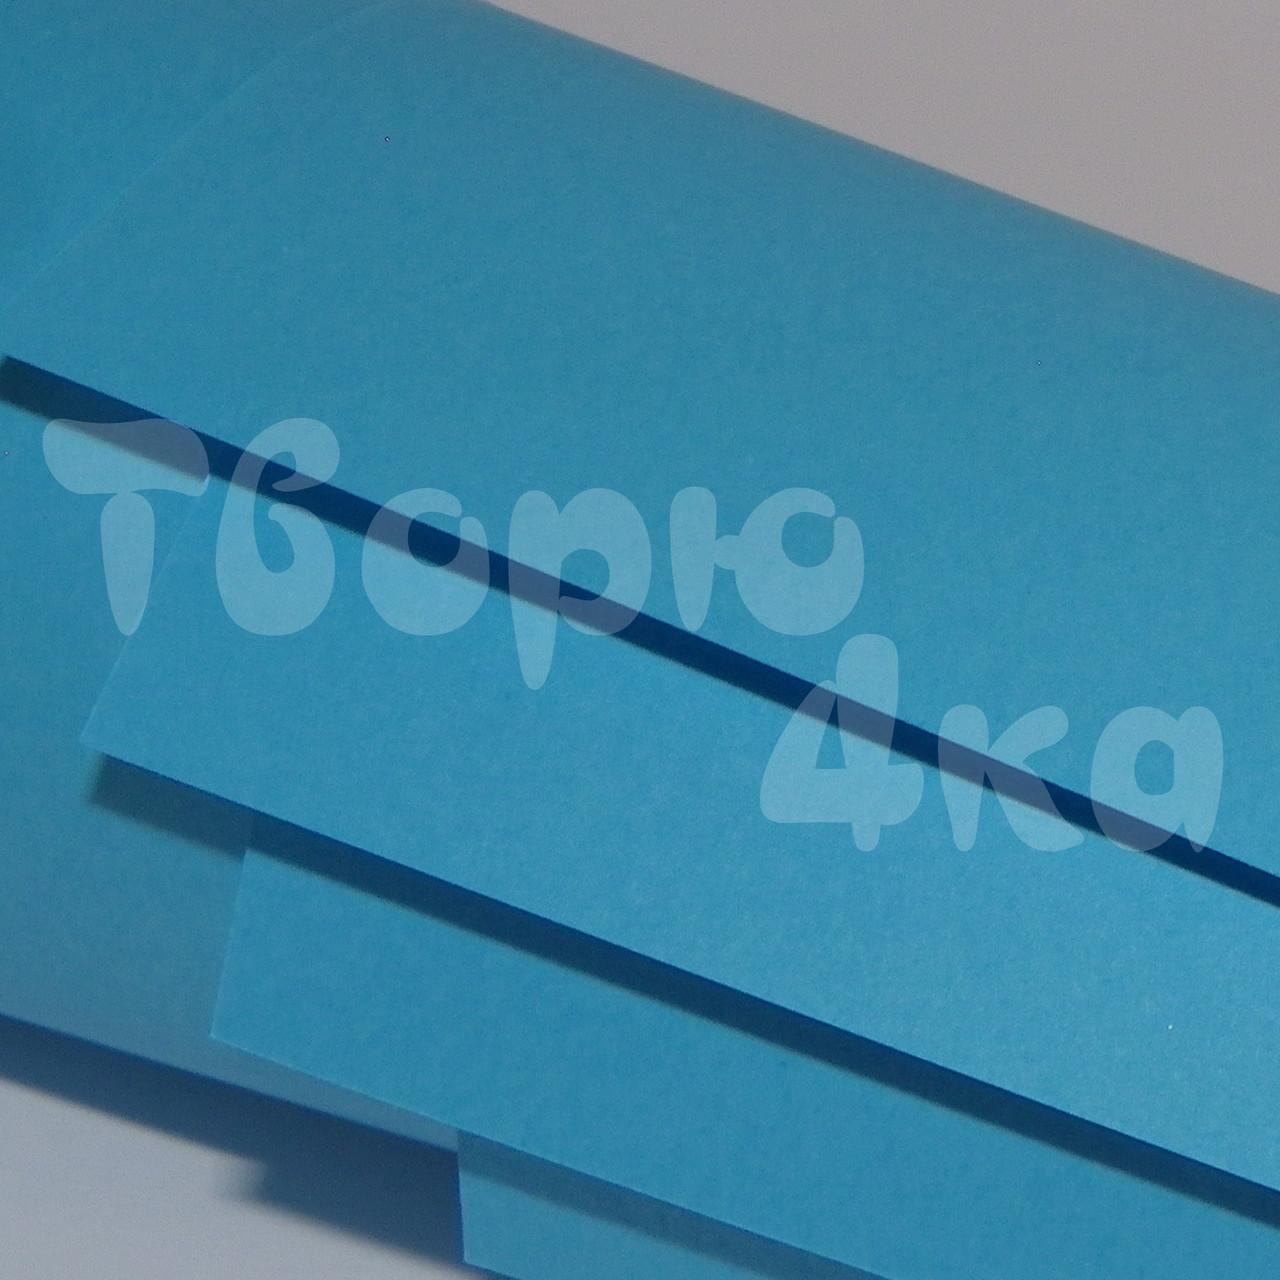 Бумага цветная А4 160 гр/м.кв deep turquoise (бирюзовый)